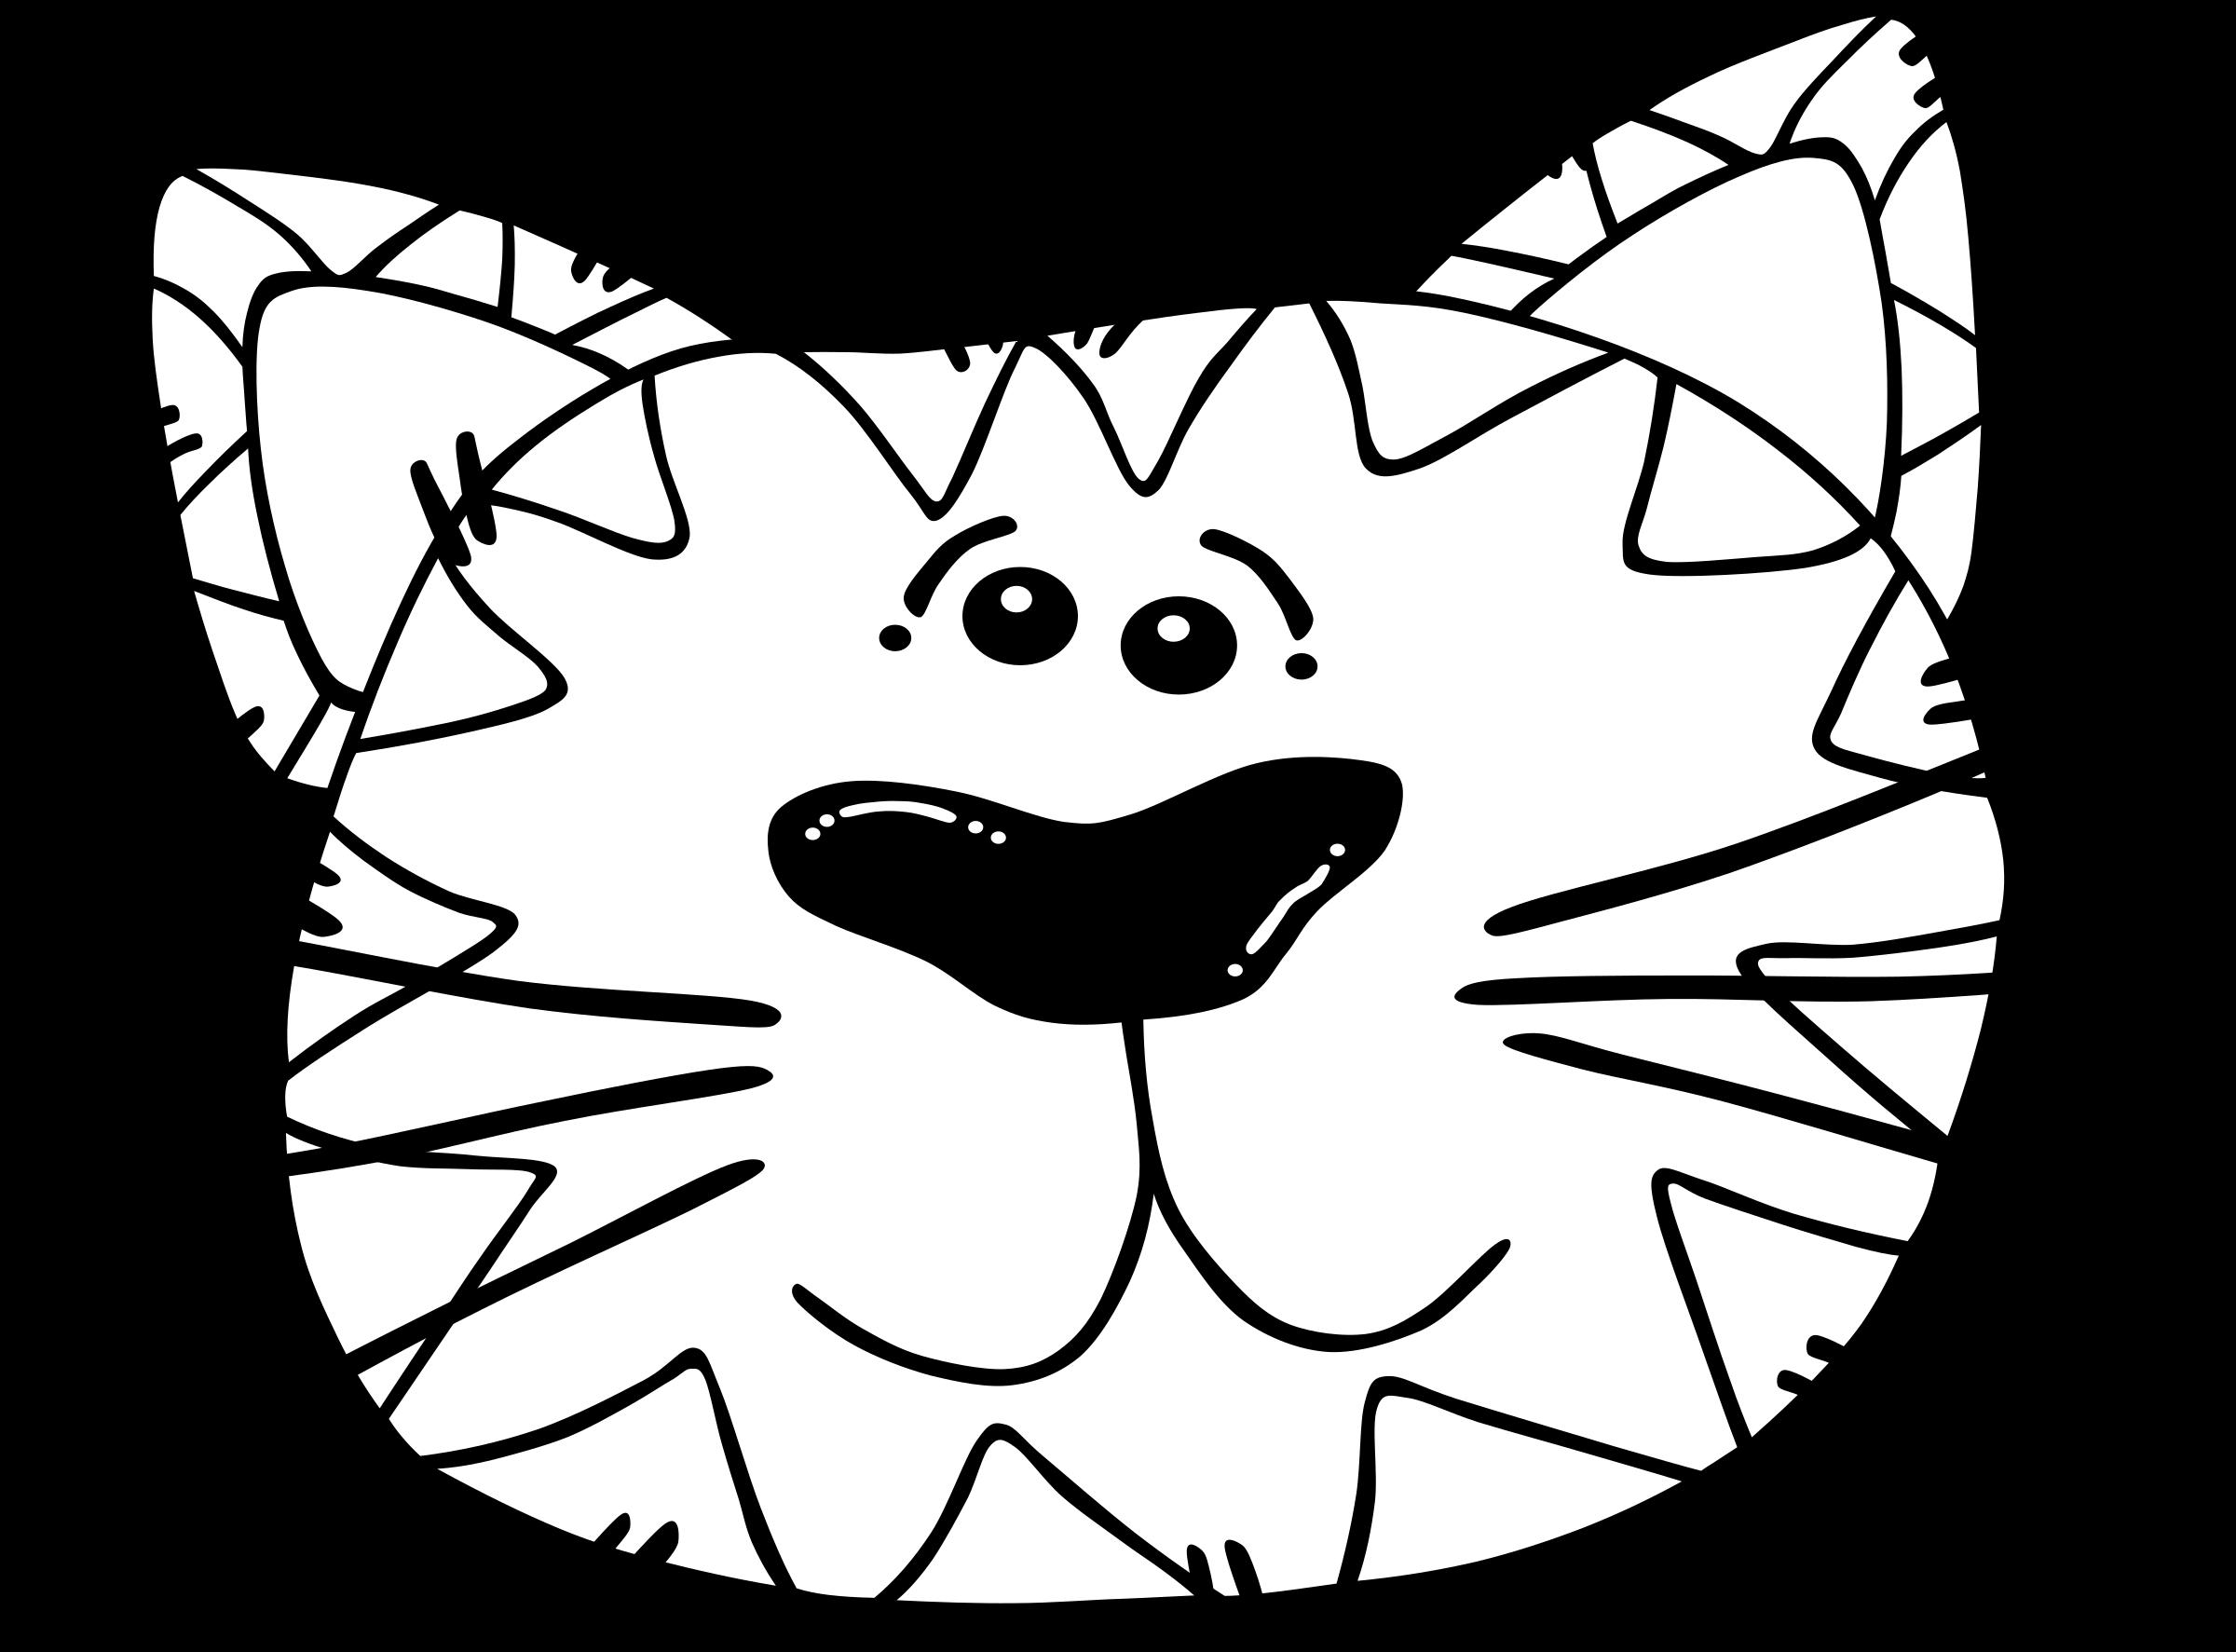 Cat line art big. Mummy clipart black and white